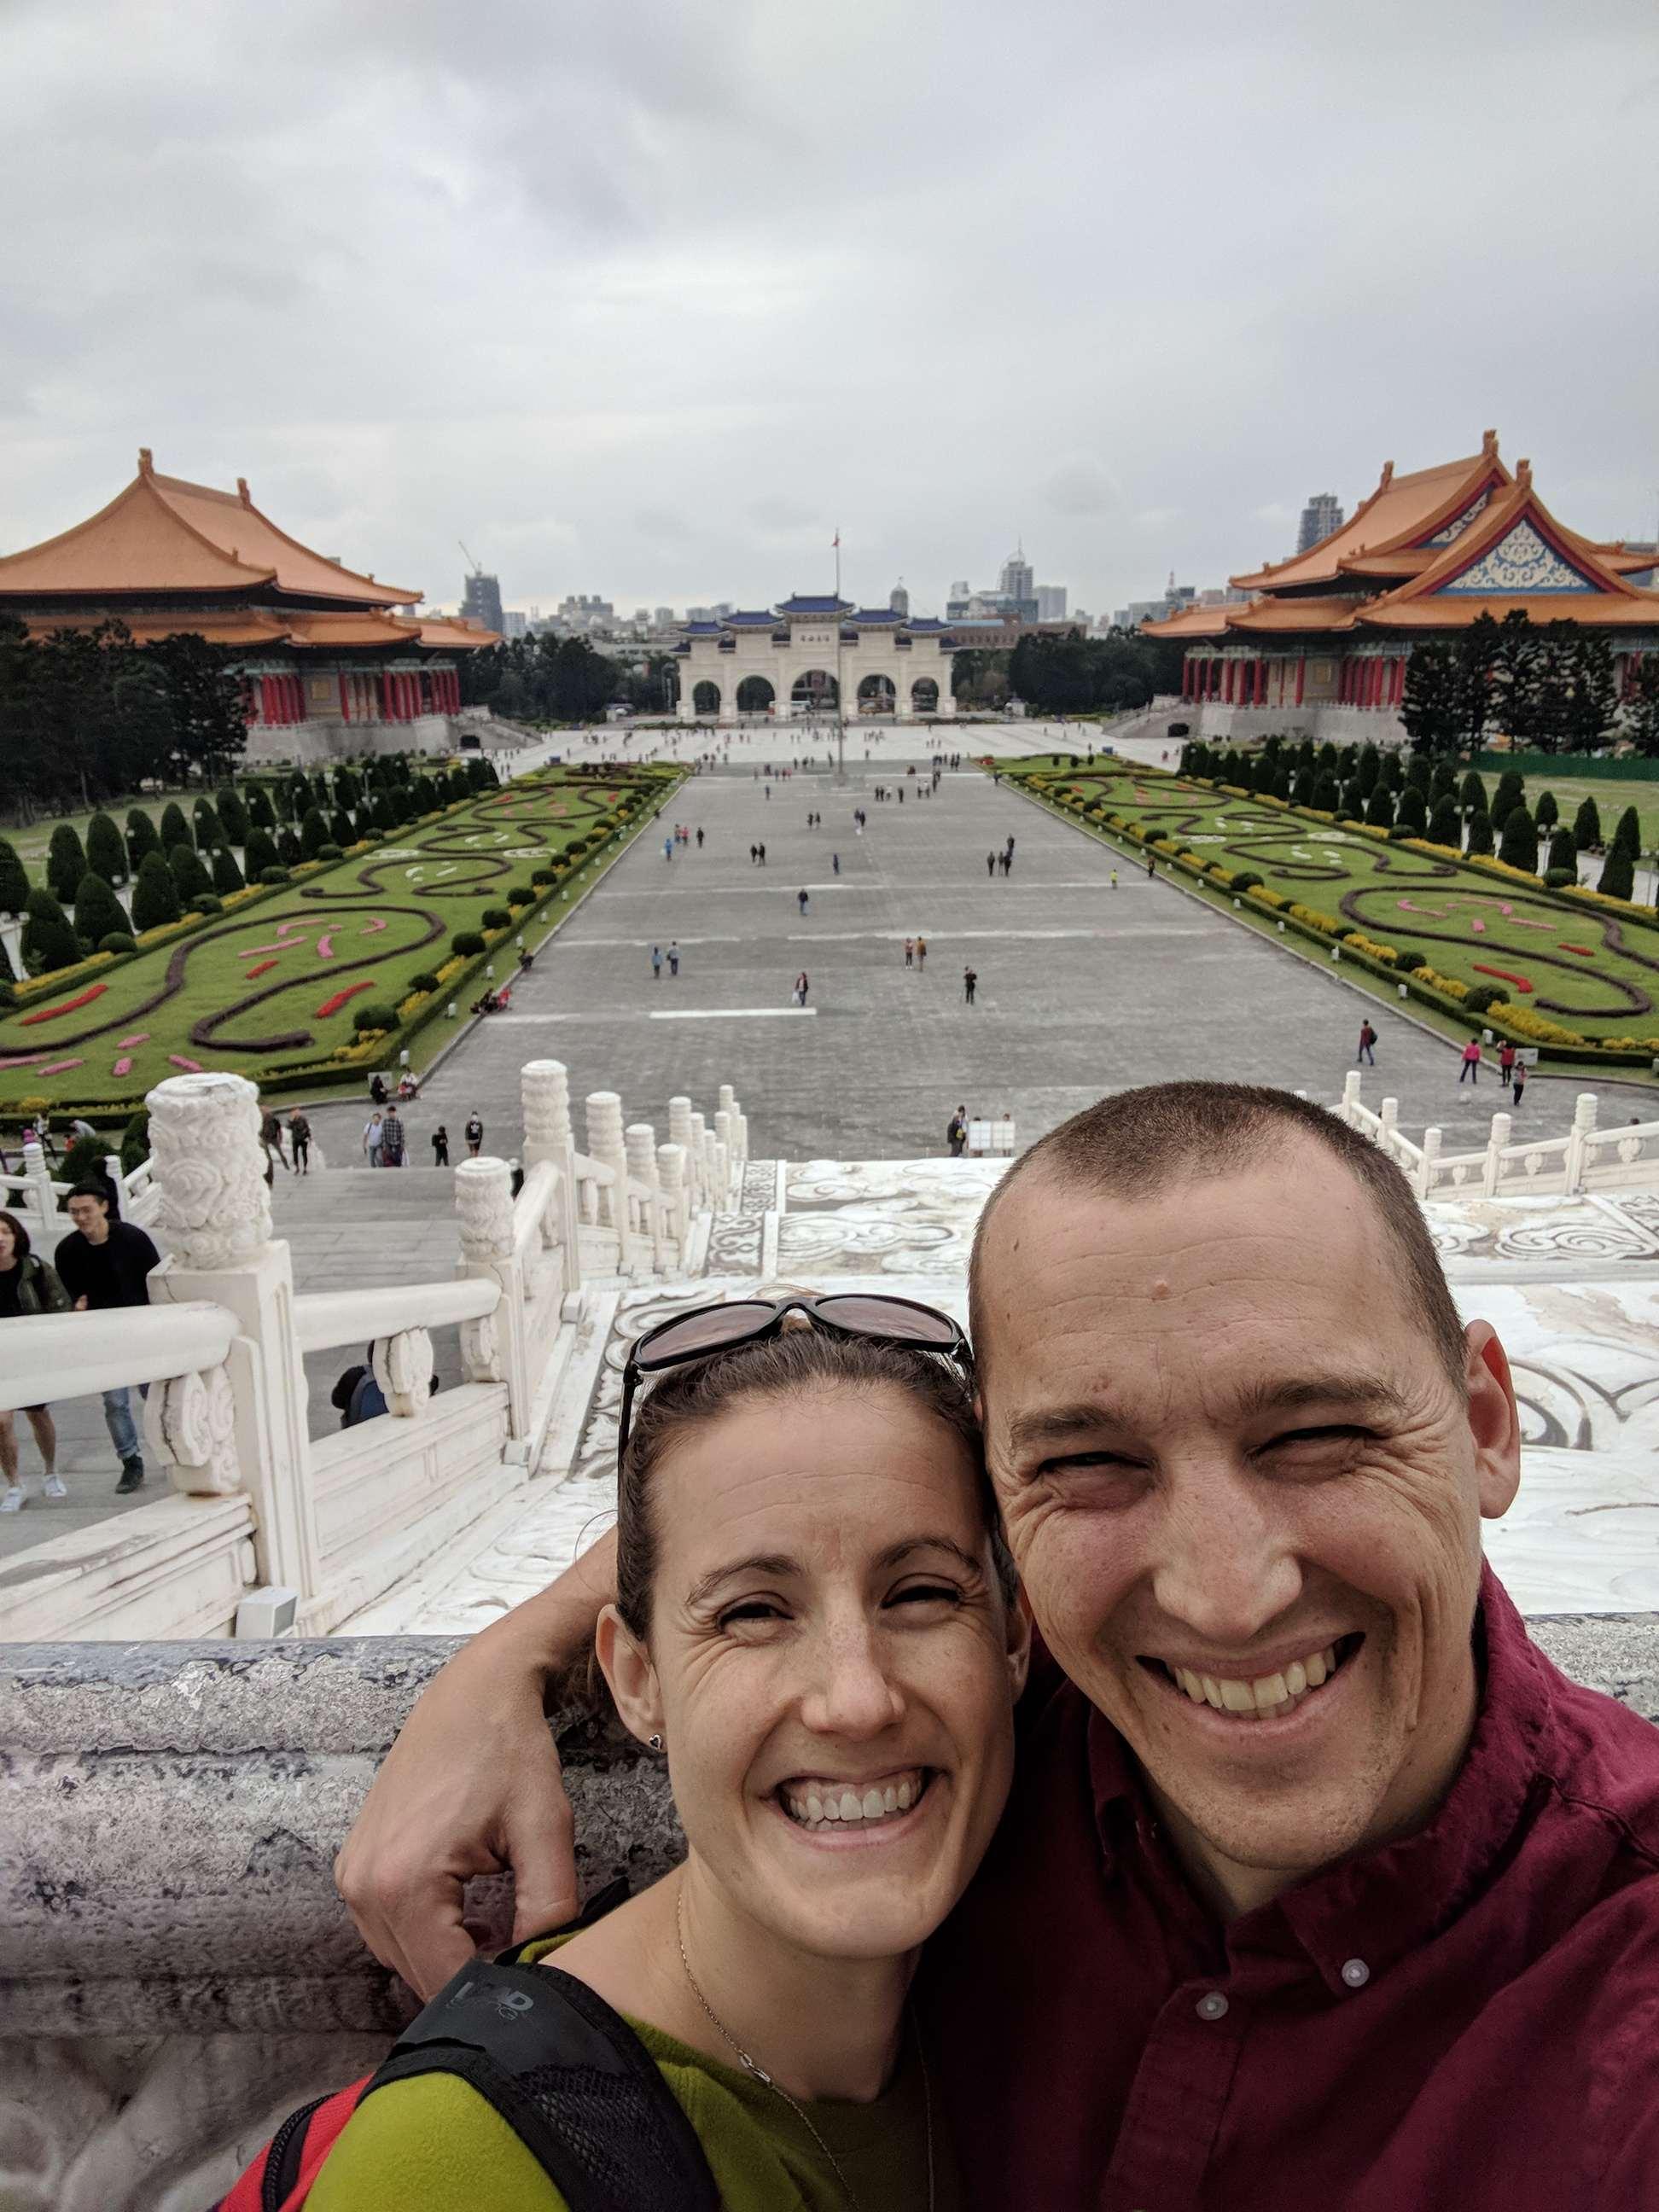 Amelia and David in Taiwan, New Year's 2018